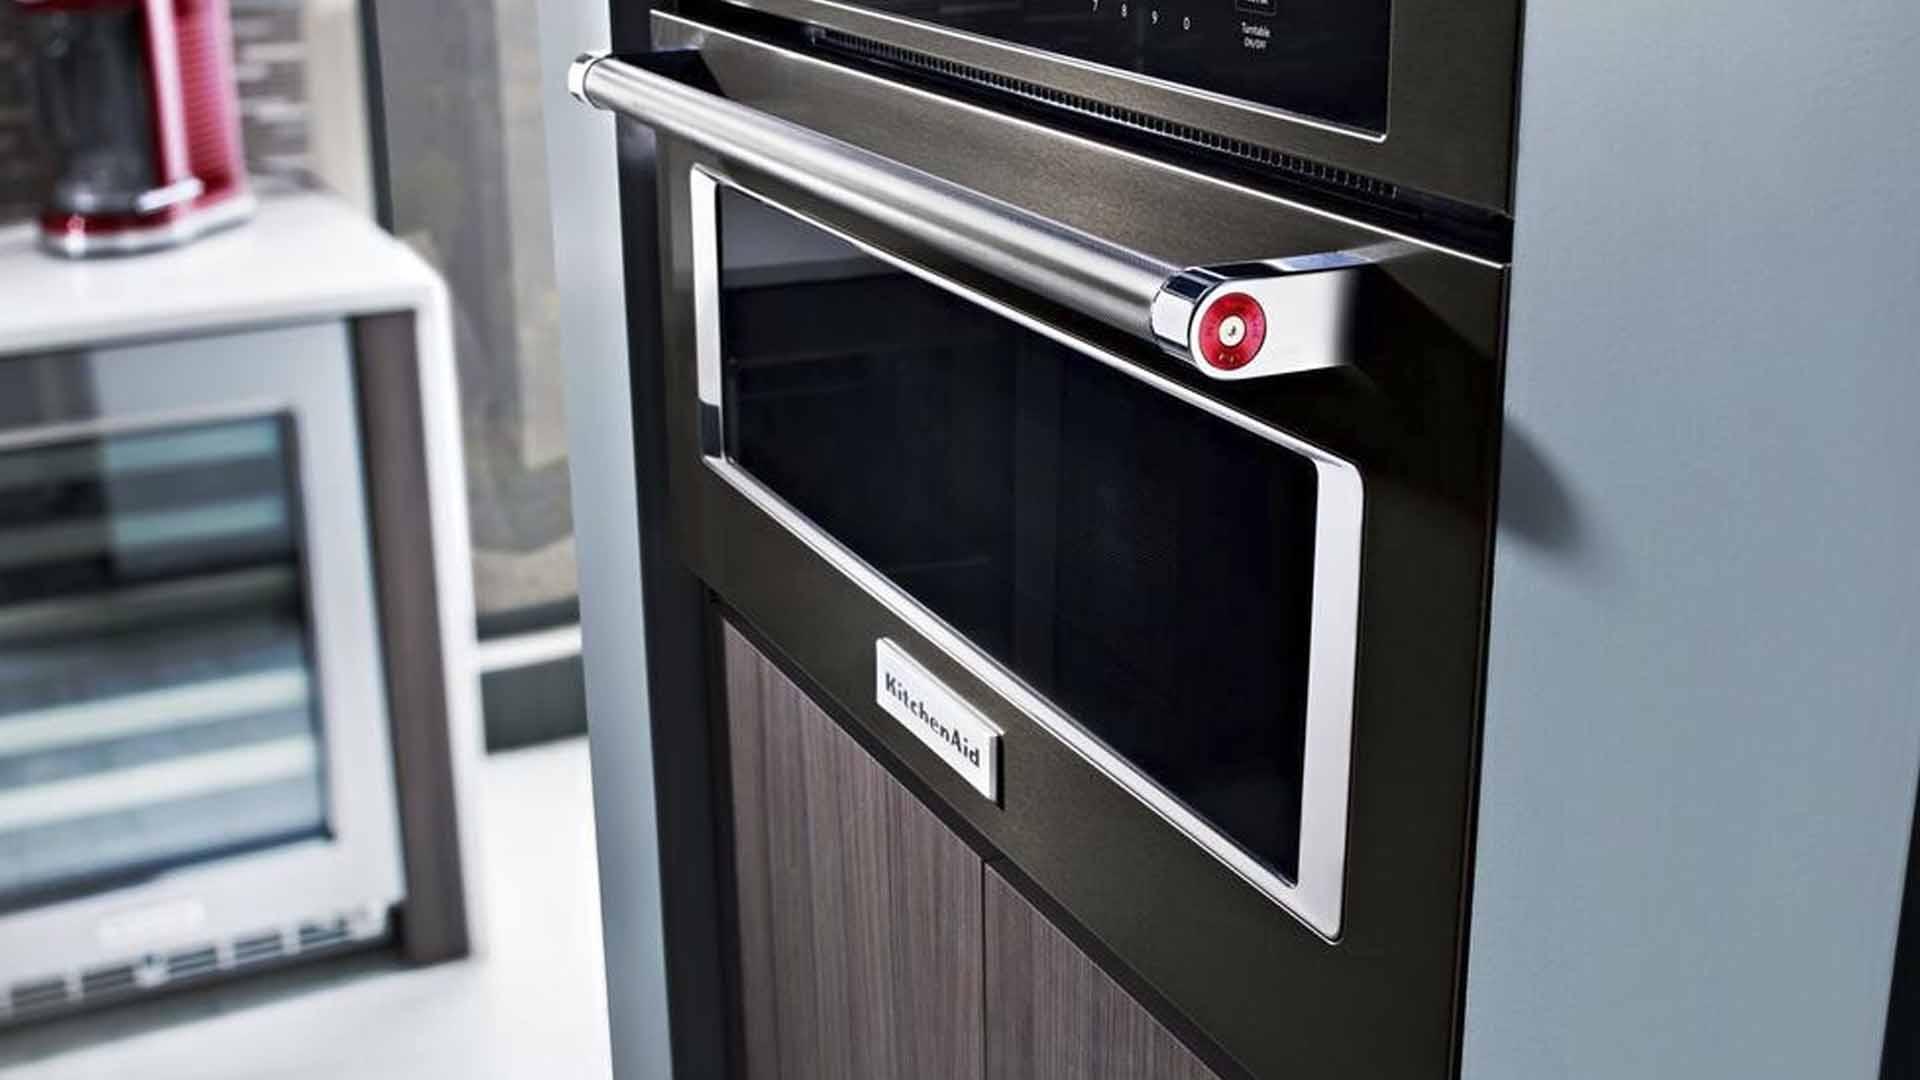 KitchenAid Built-In Microwave Repair Service | KitchenAid Repairs